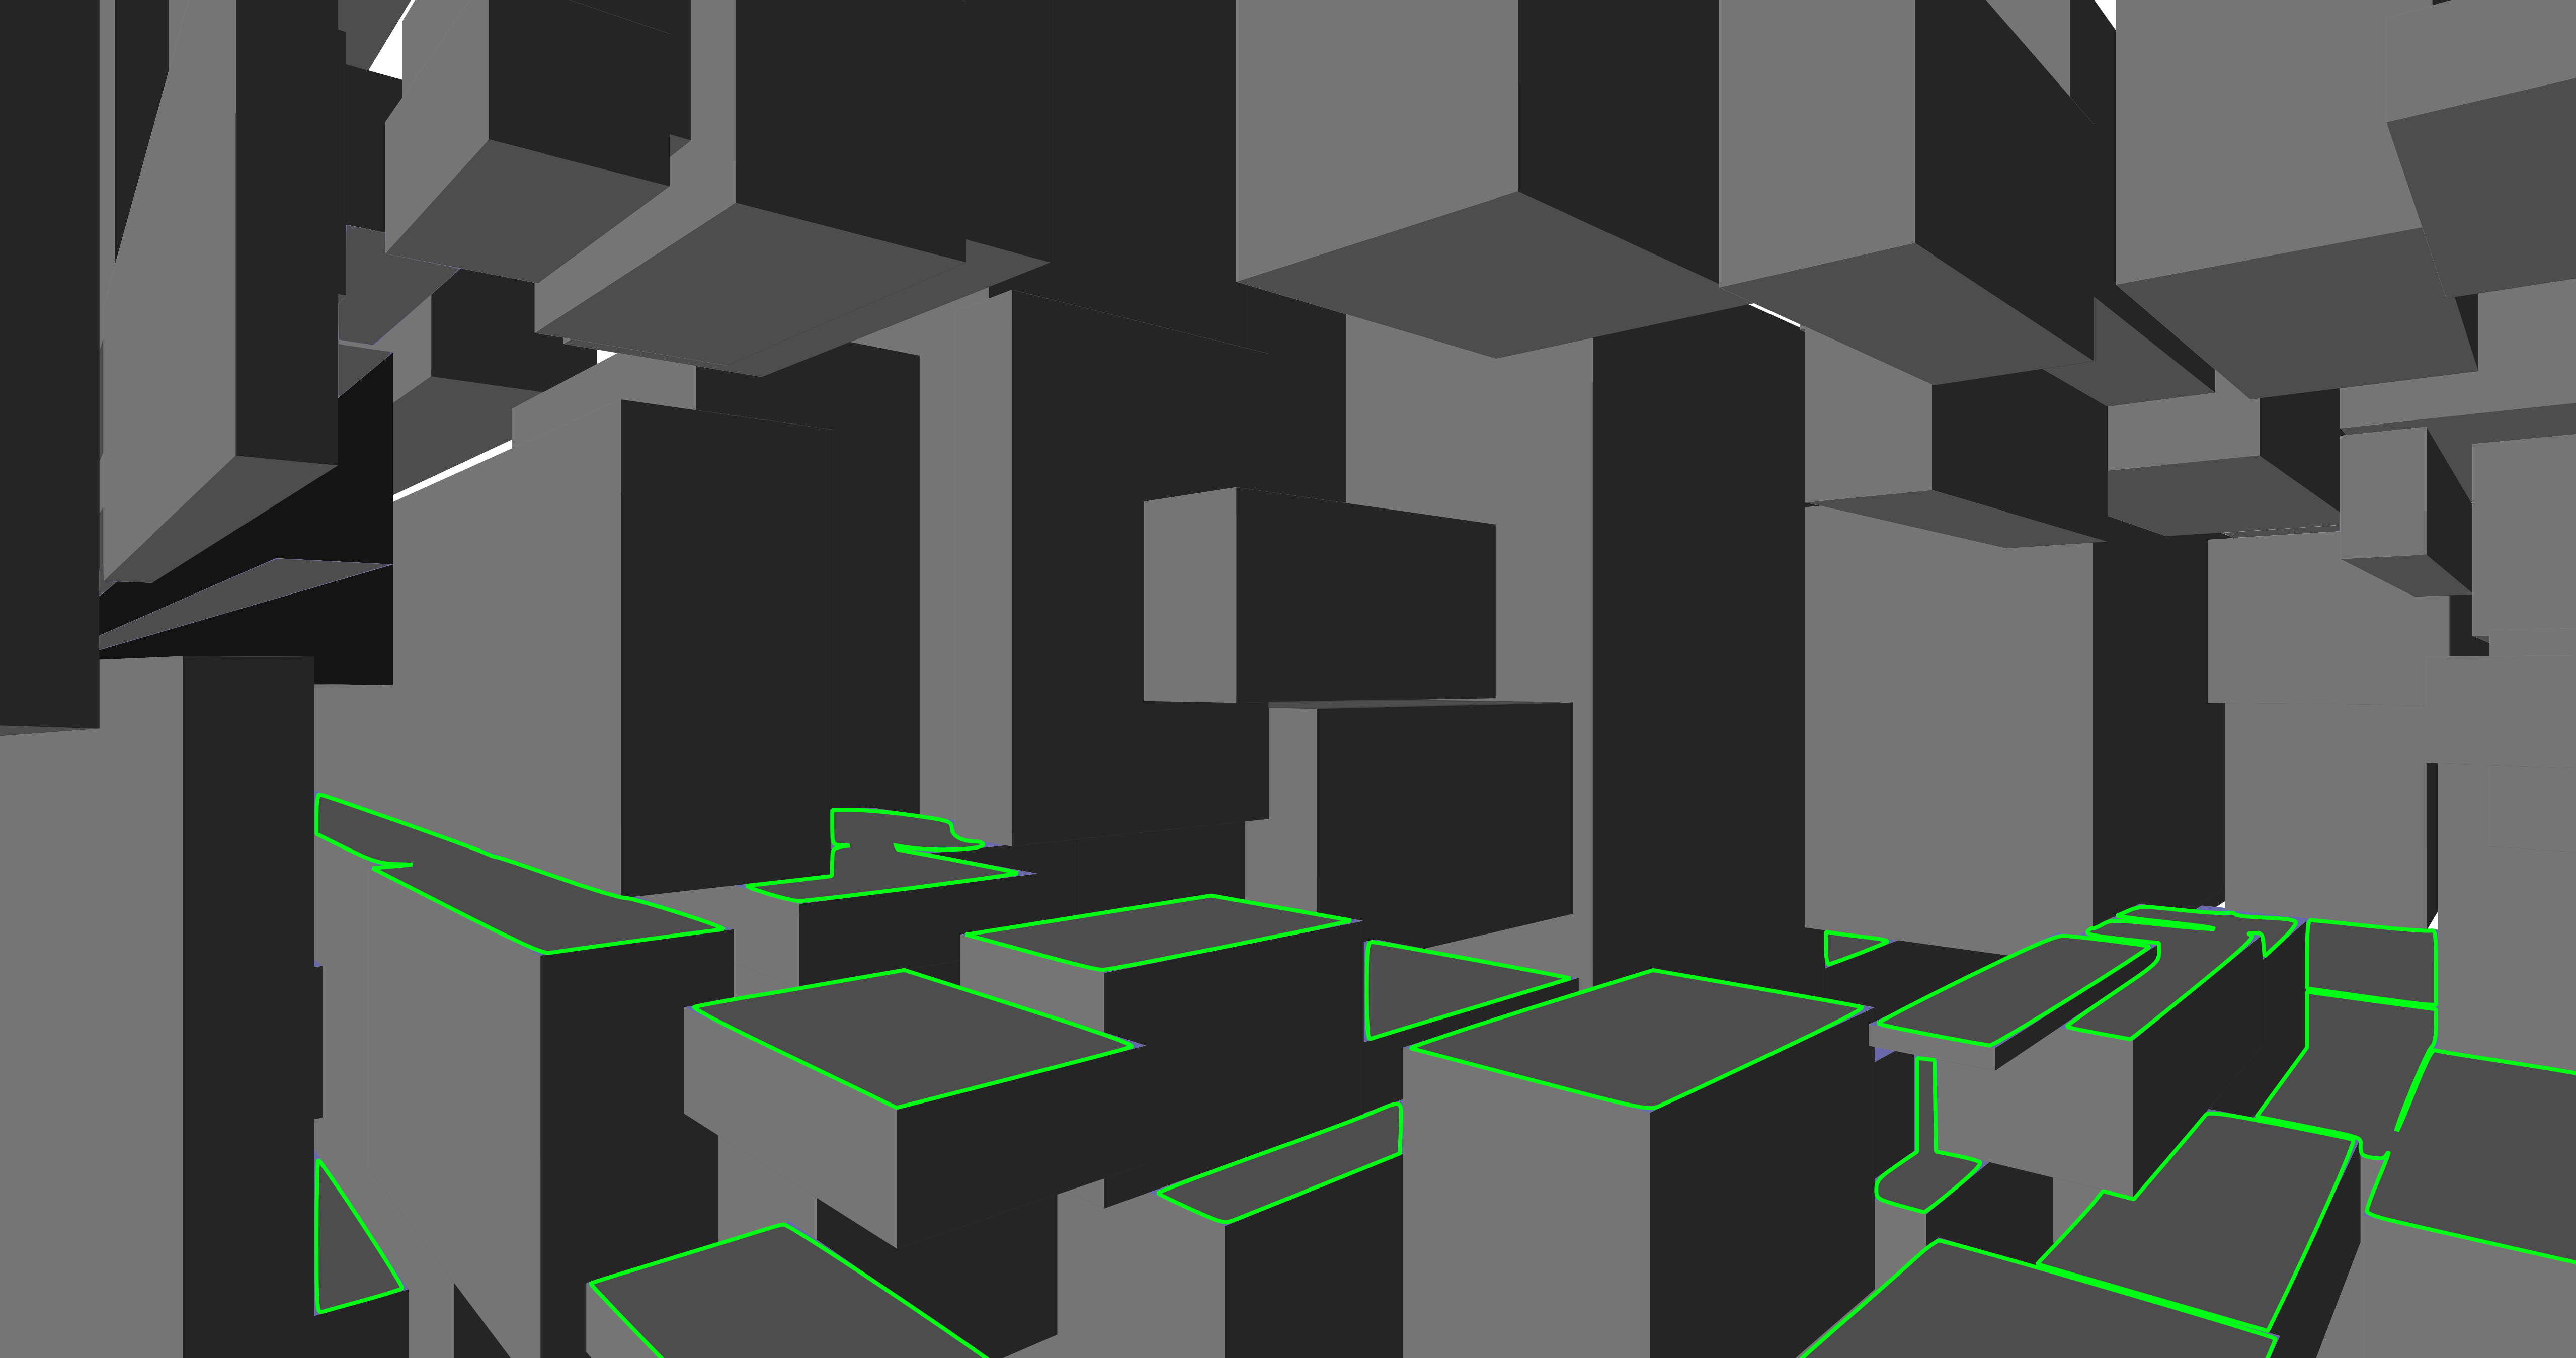 5k Cubes Wallpaper By Pleb Lord